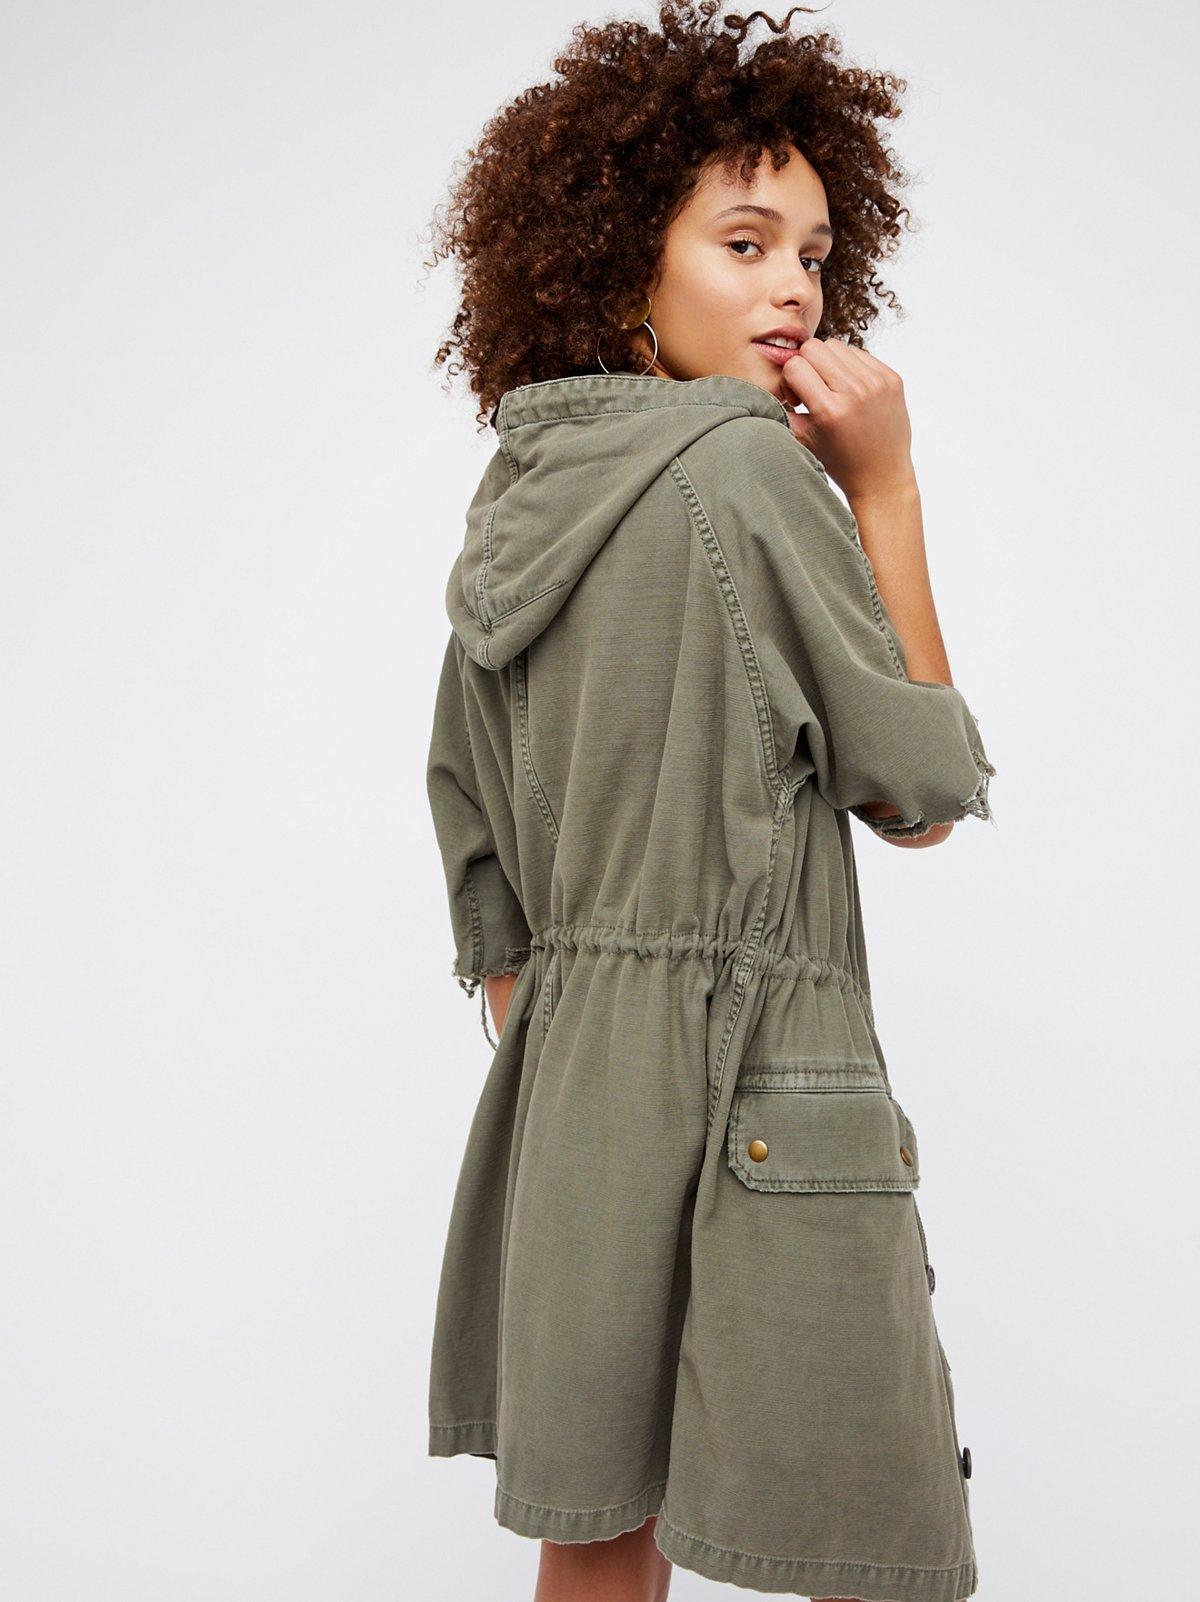 Reworked Army Jacket